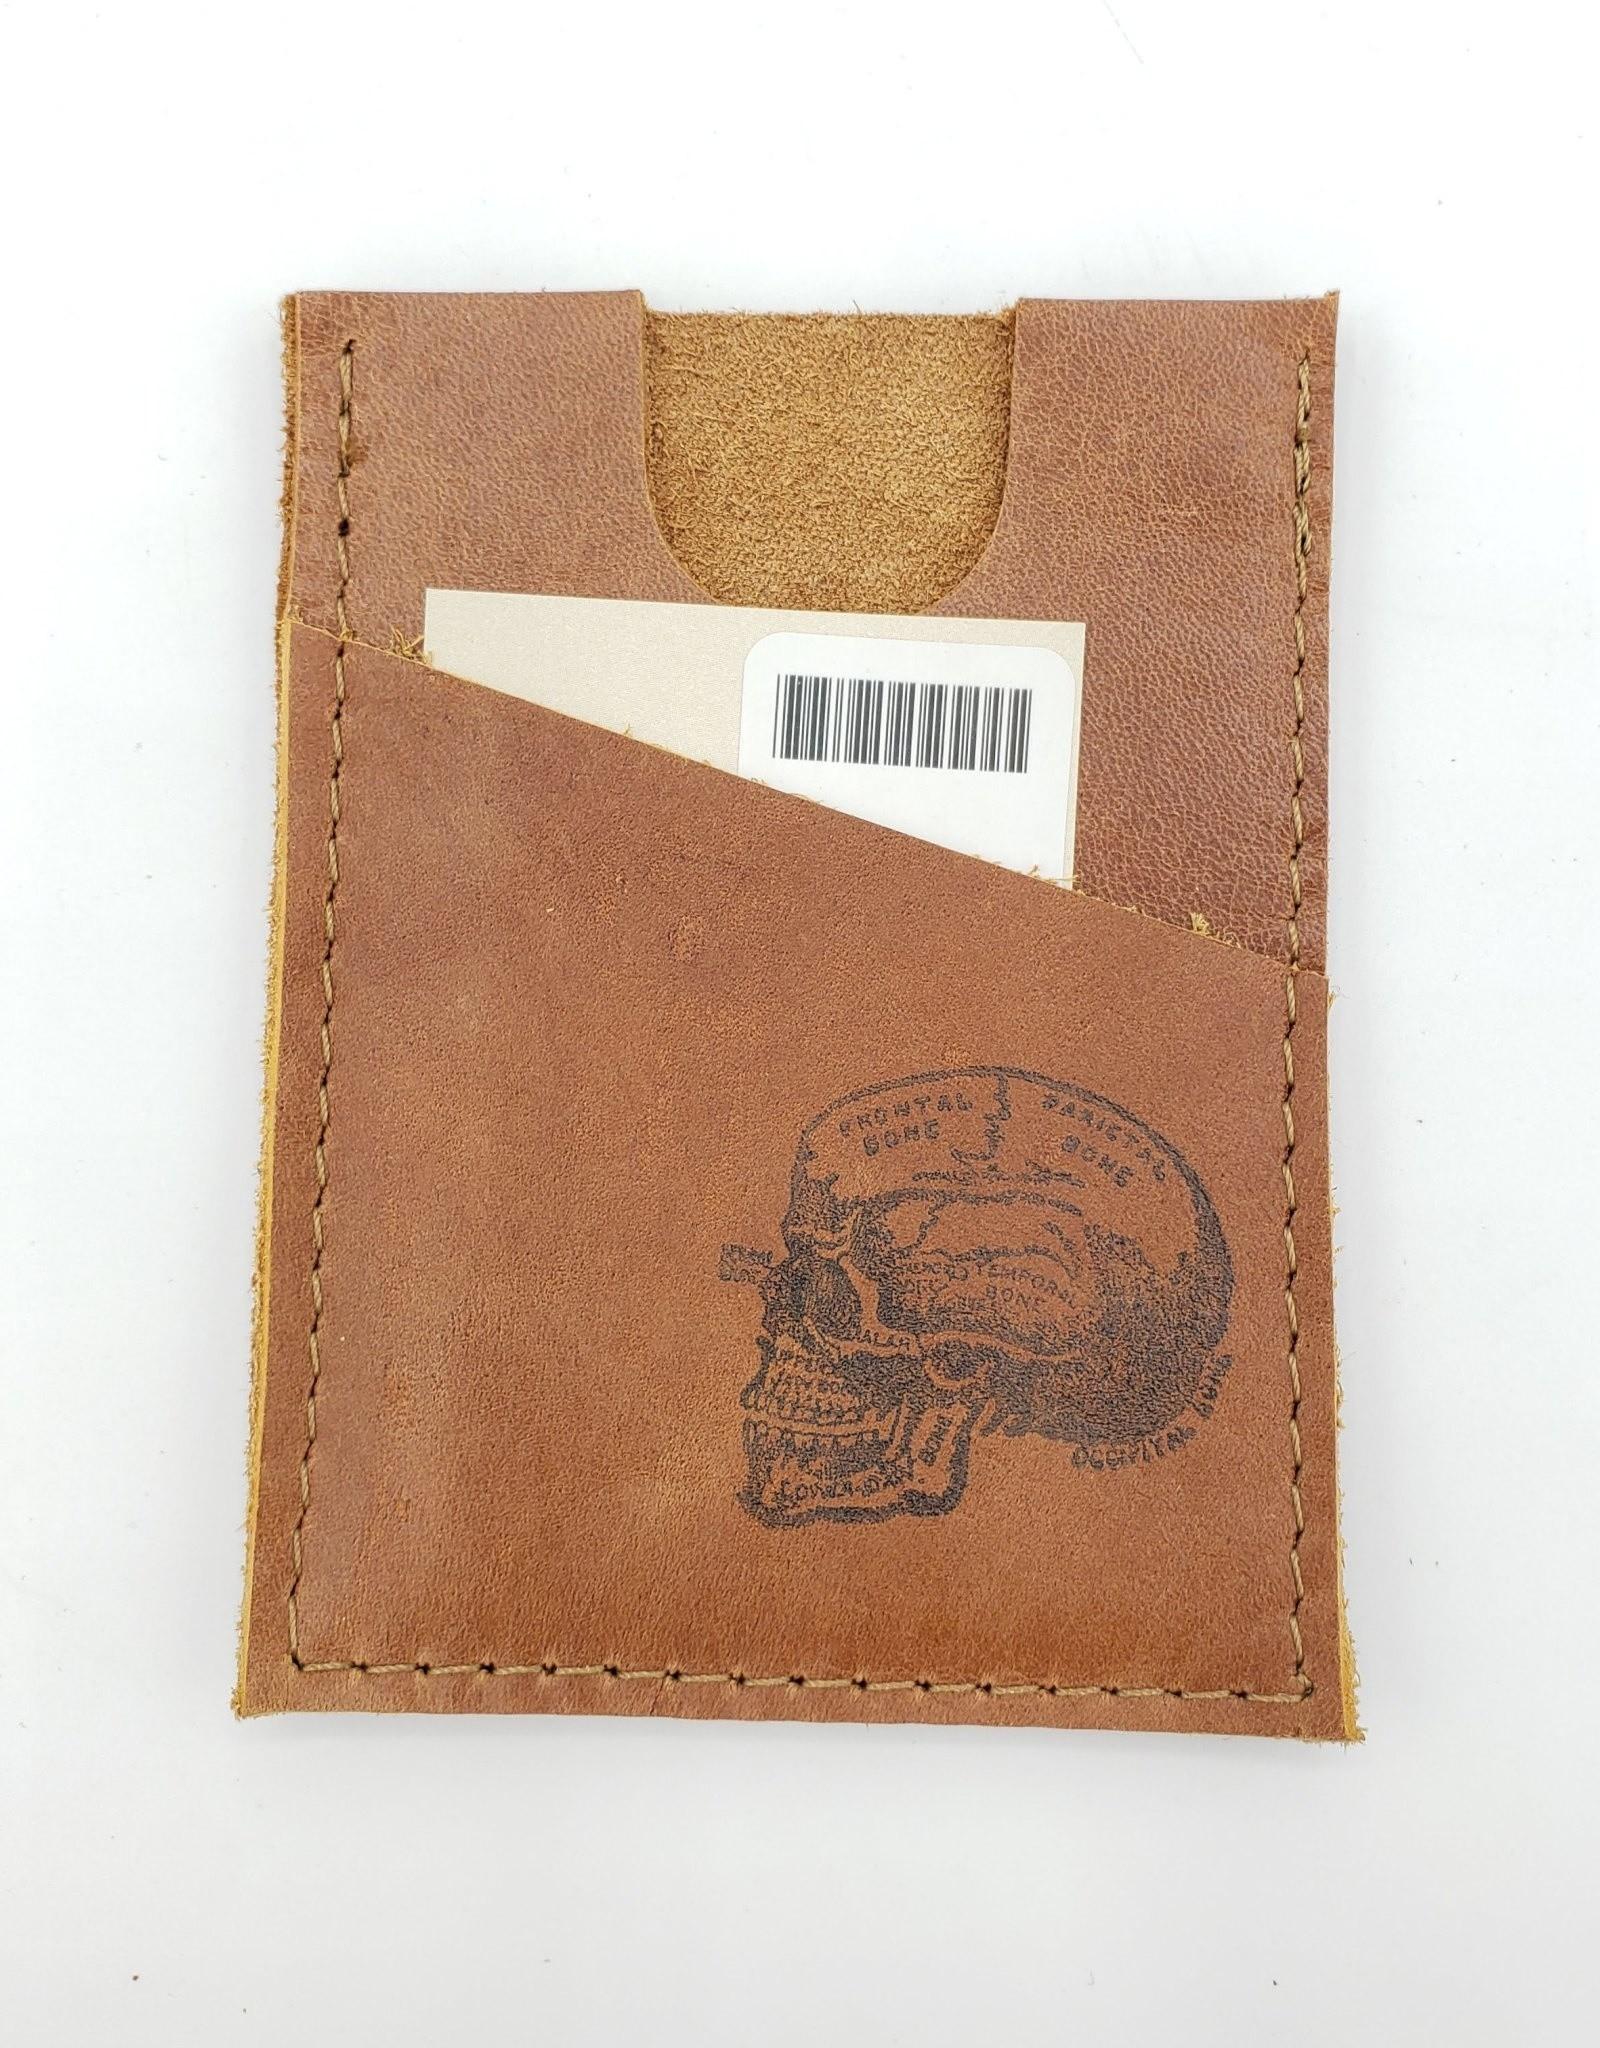 In Blue Handmade Skull - Train Ticket & Card Leather Wallet